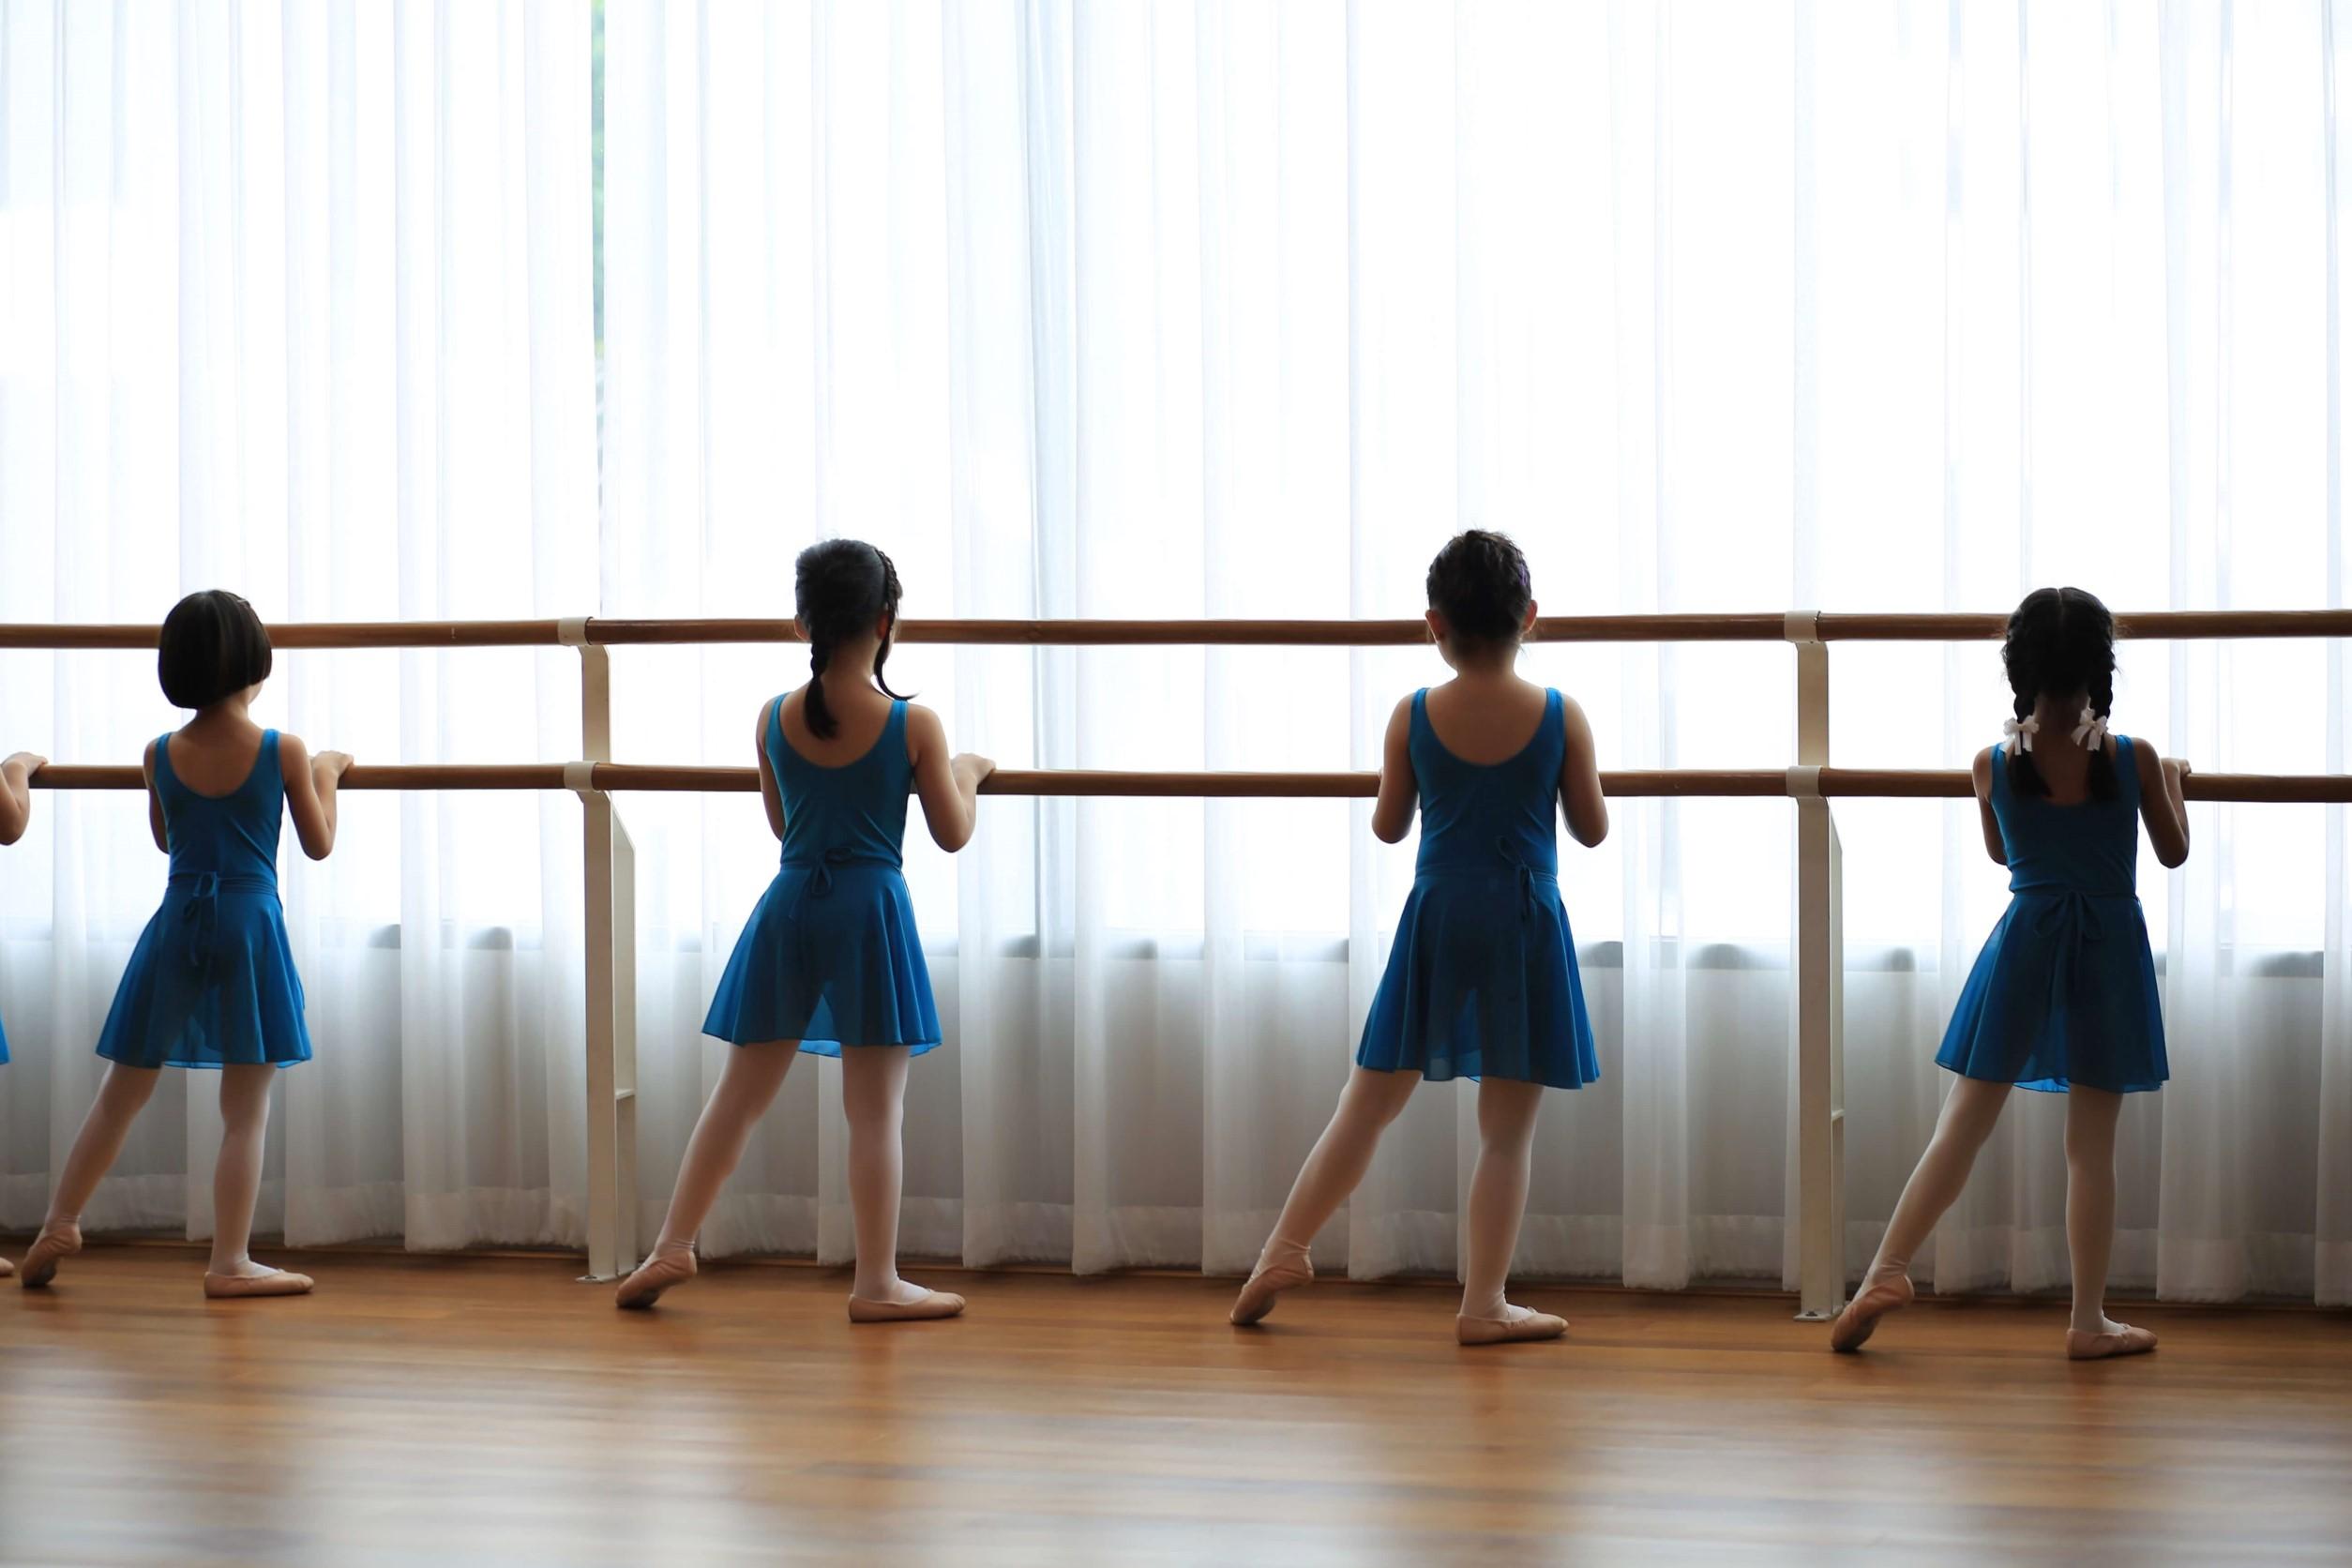 The Artists Dance Studio ballet for kids adult ballet dance yoga BTS punnavithi studio class